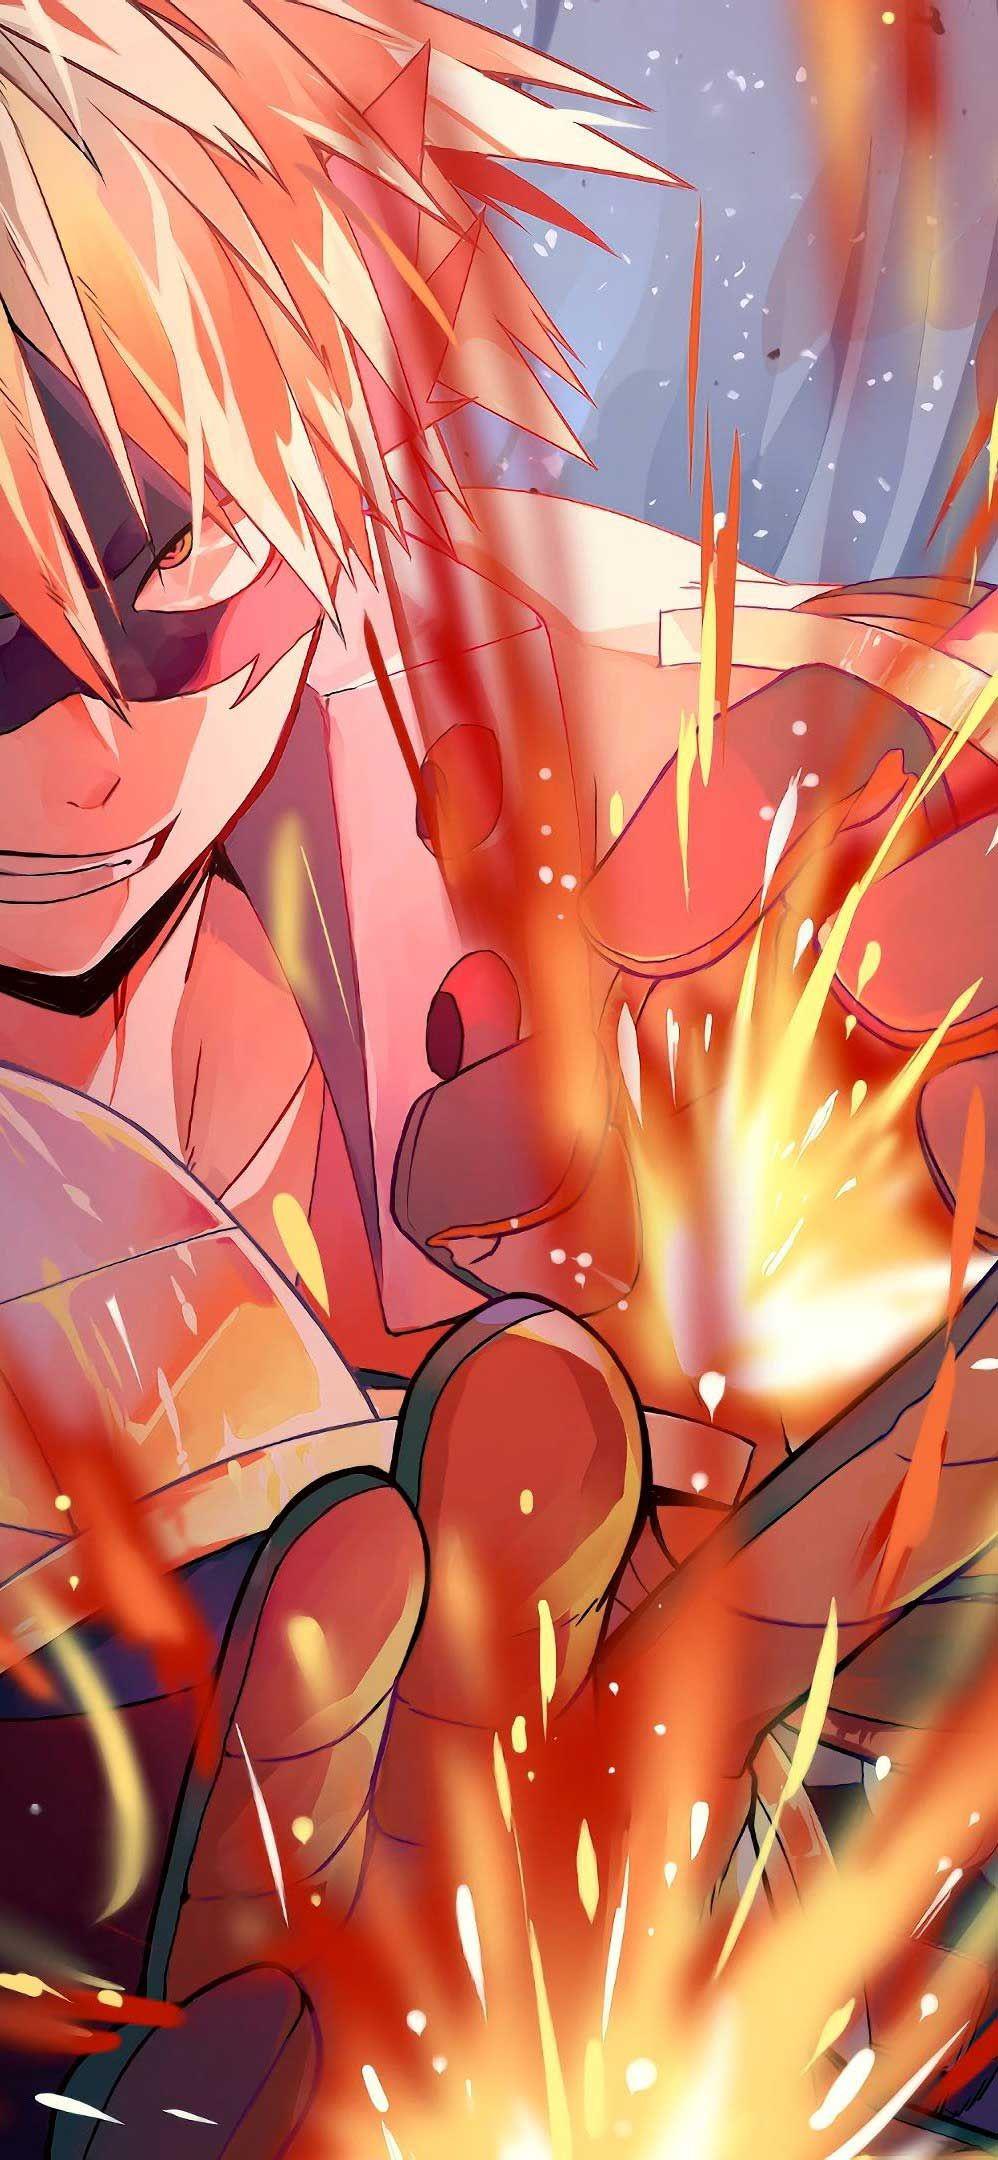 Katsuki Bakugou My Hero Academic K O Iphone Pro Ma Wallpaper Hero Wallpaper Anime Wallpaper Anime Wallpaper Iphone